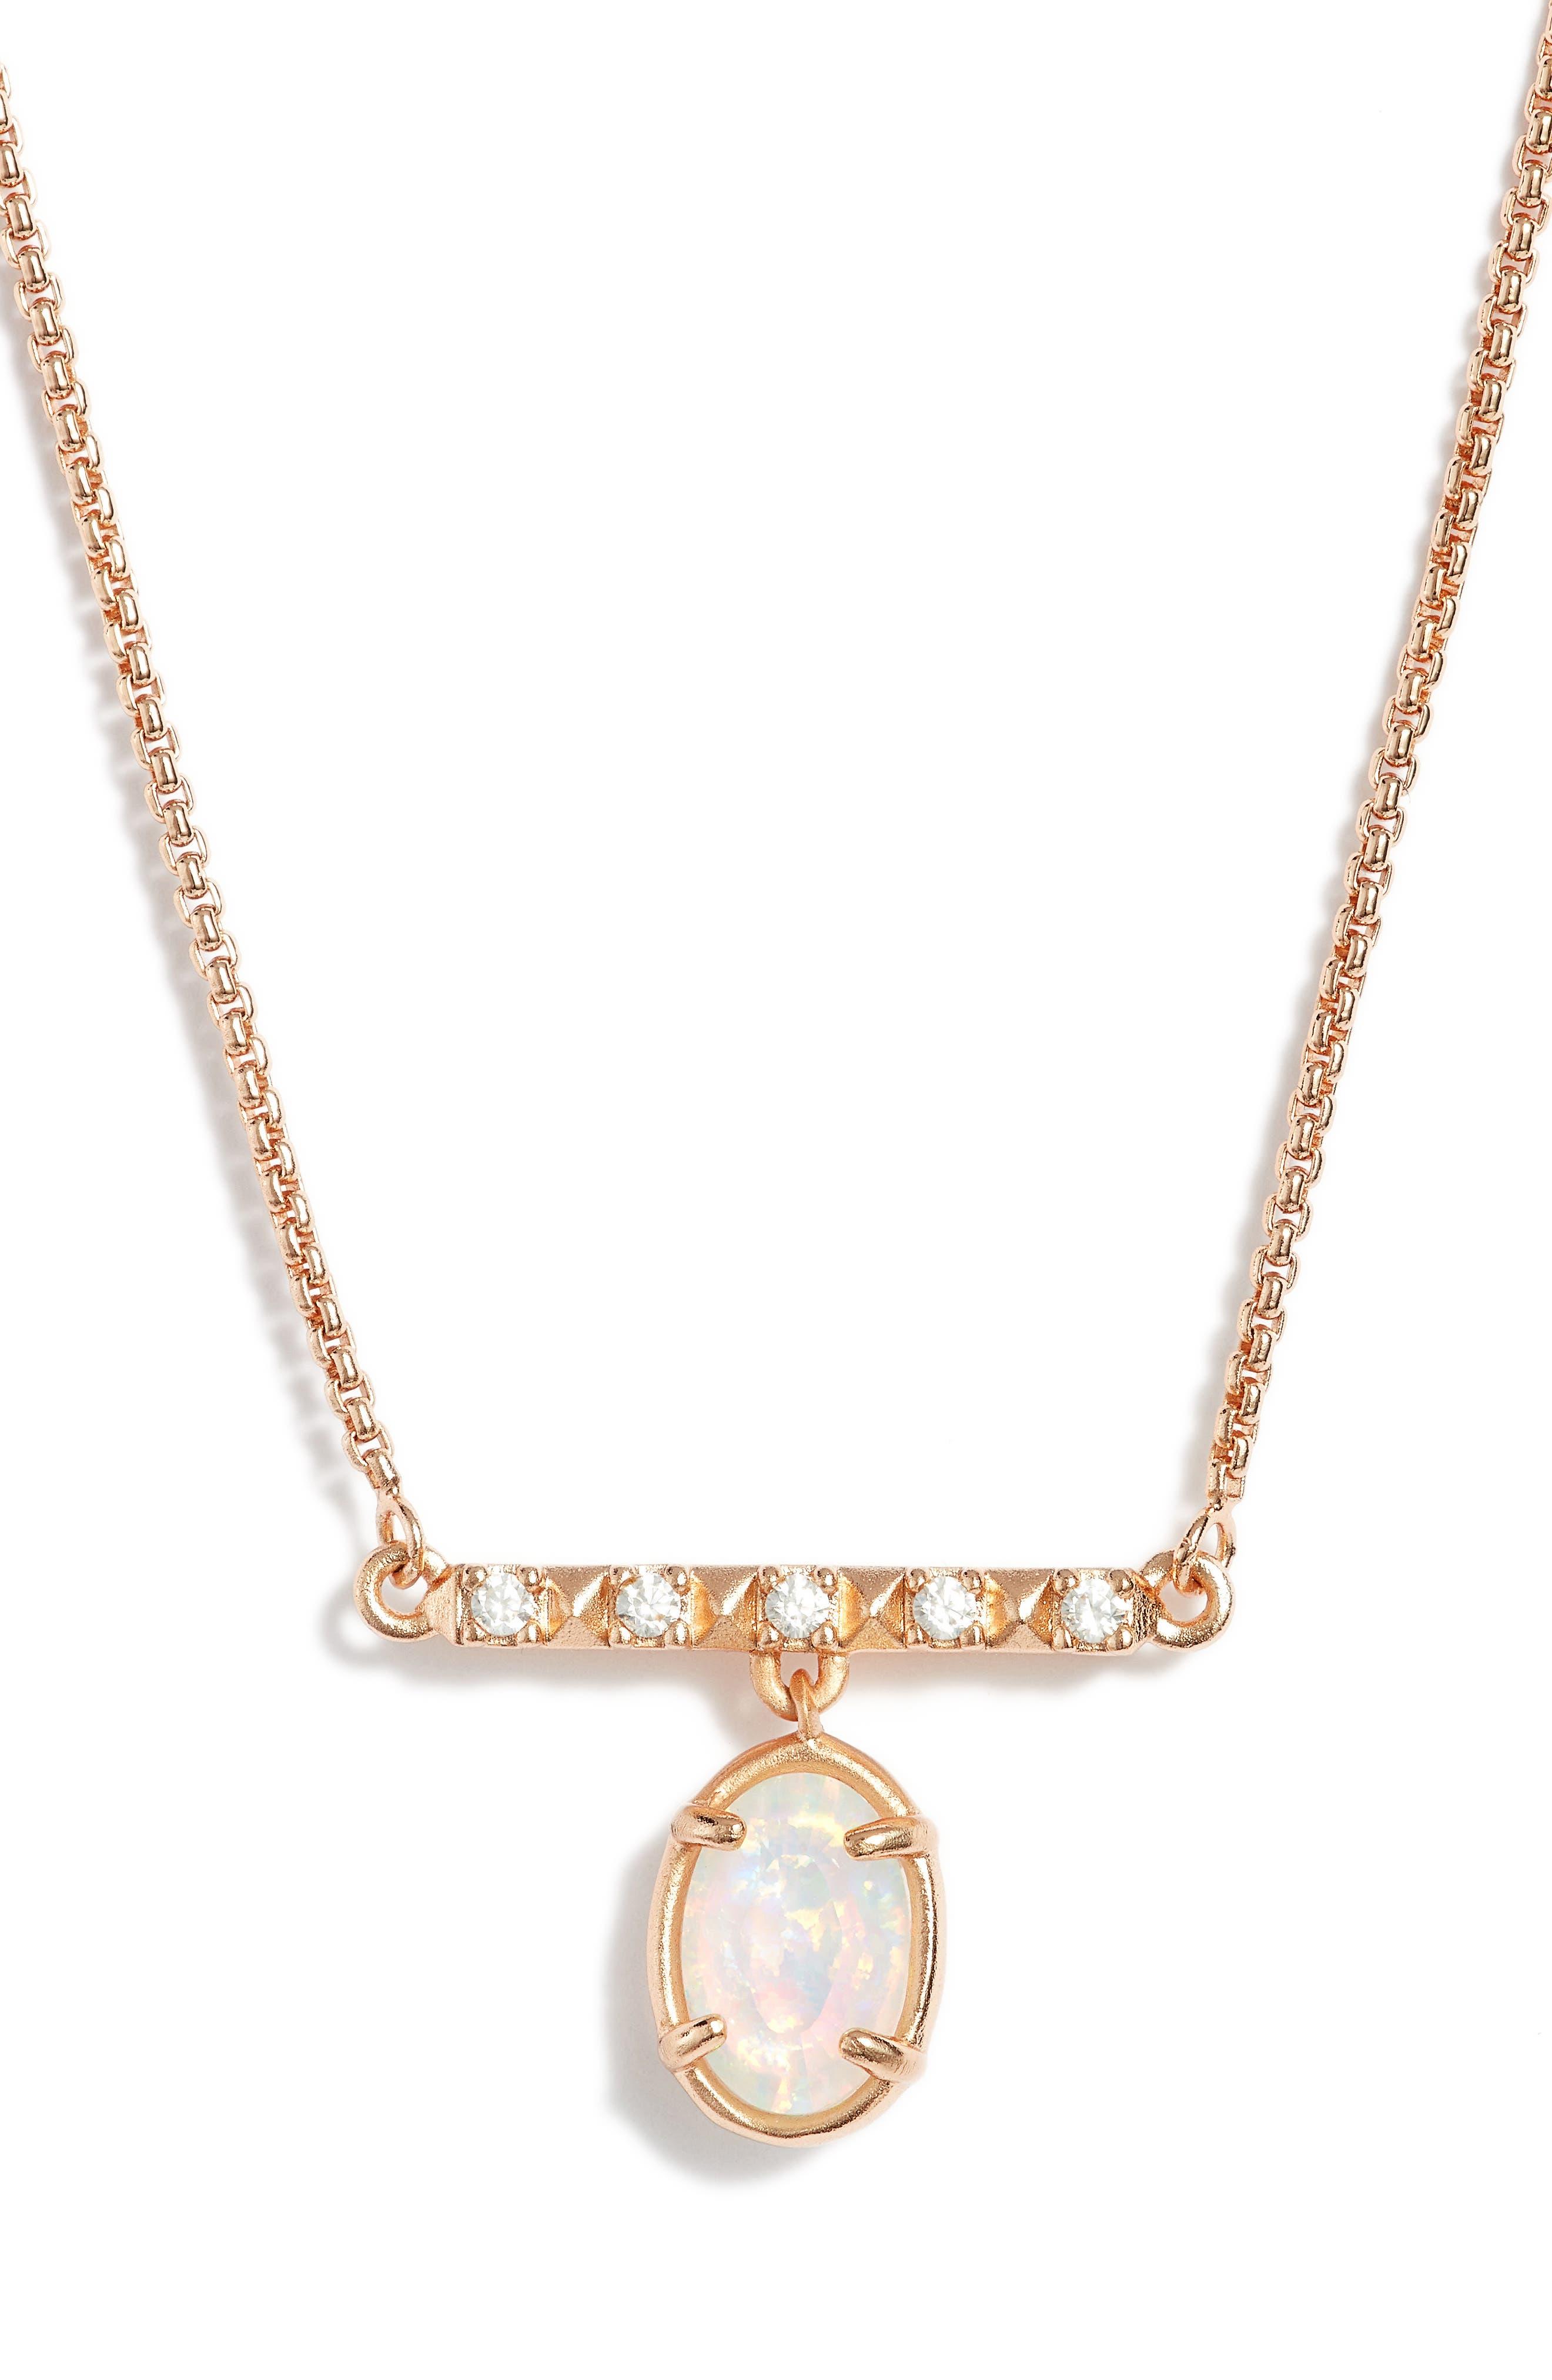 Fischer Opal Pendant Necklace,                             Main thumbnail 1, color,                             White Opal/ Rose Gold